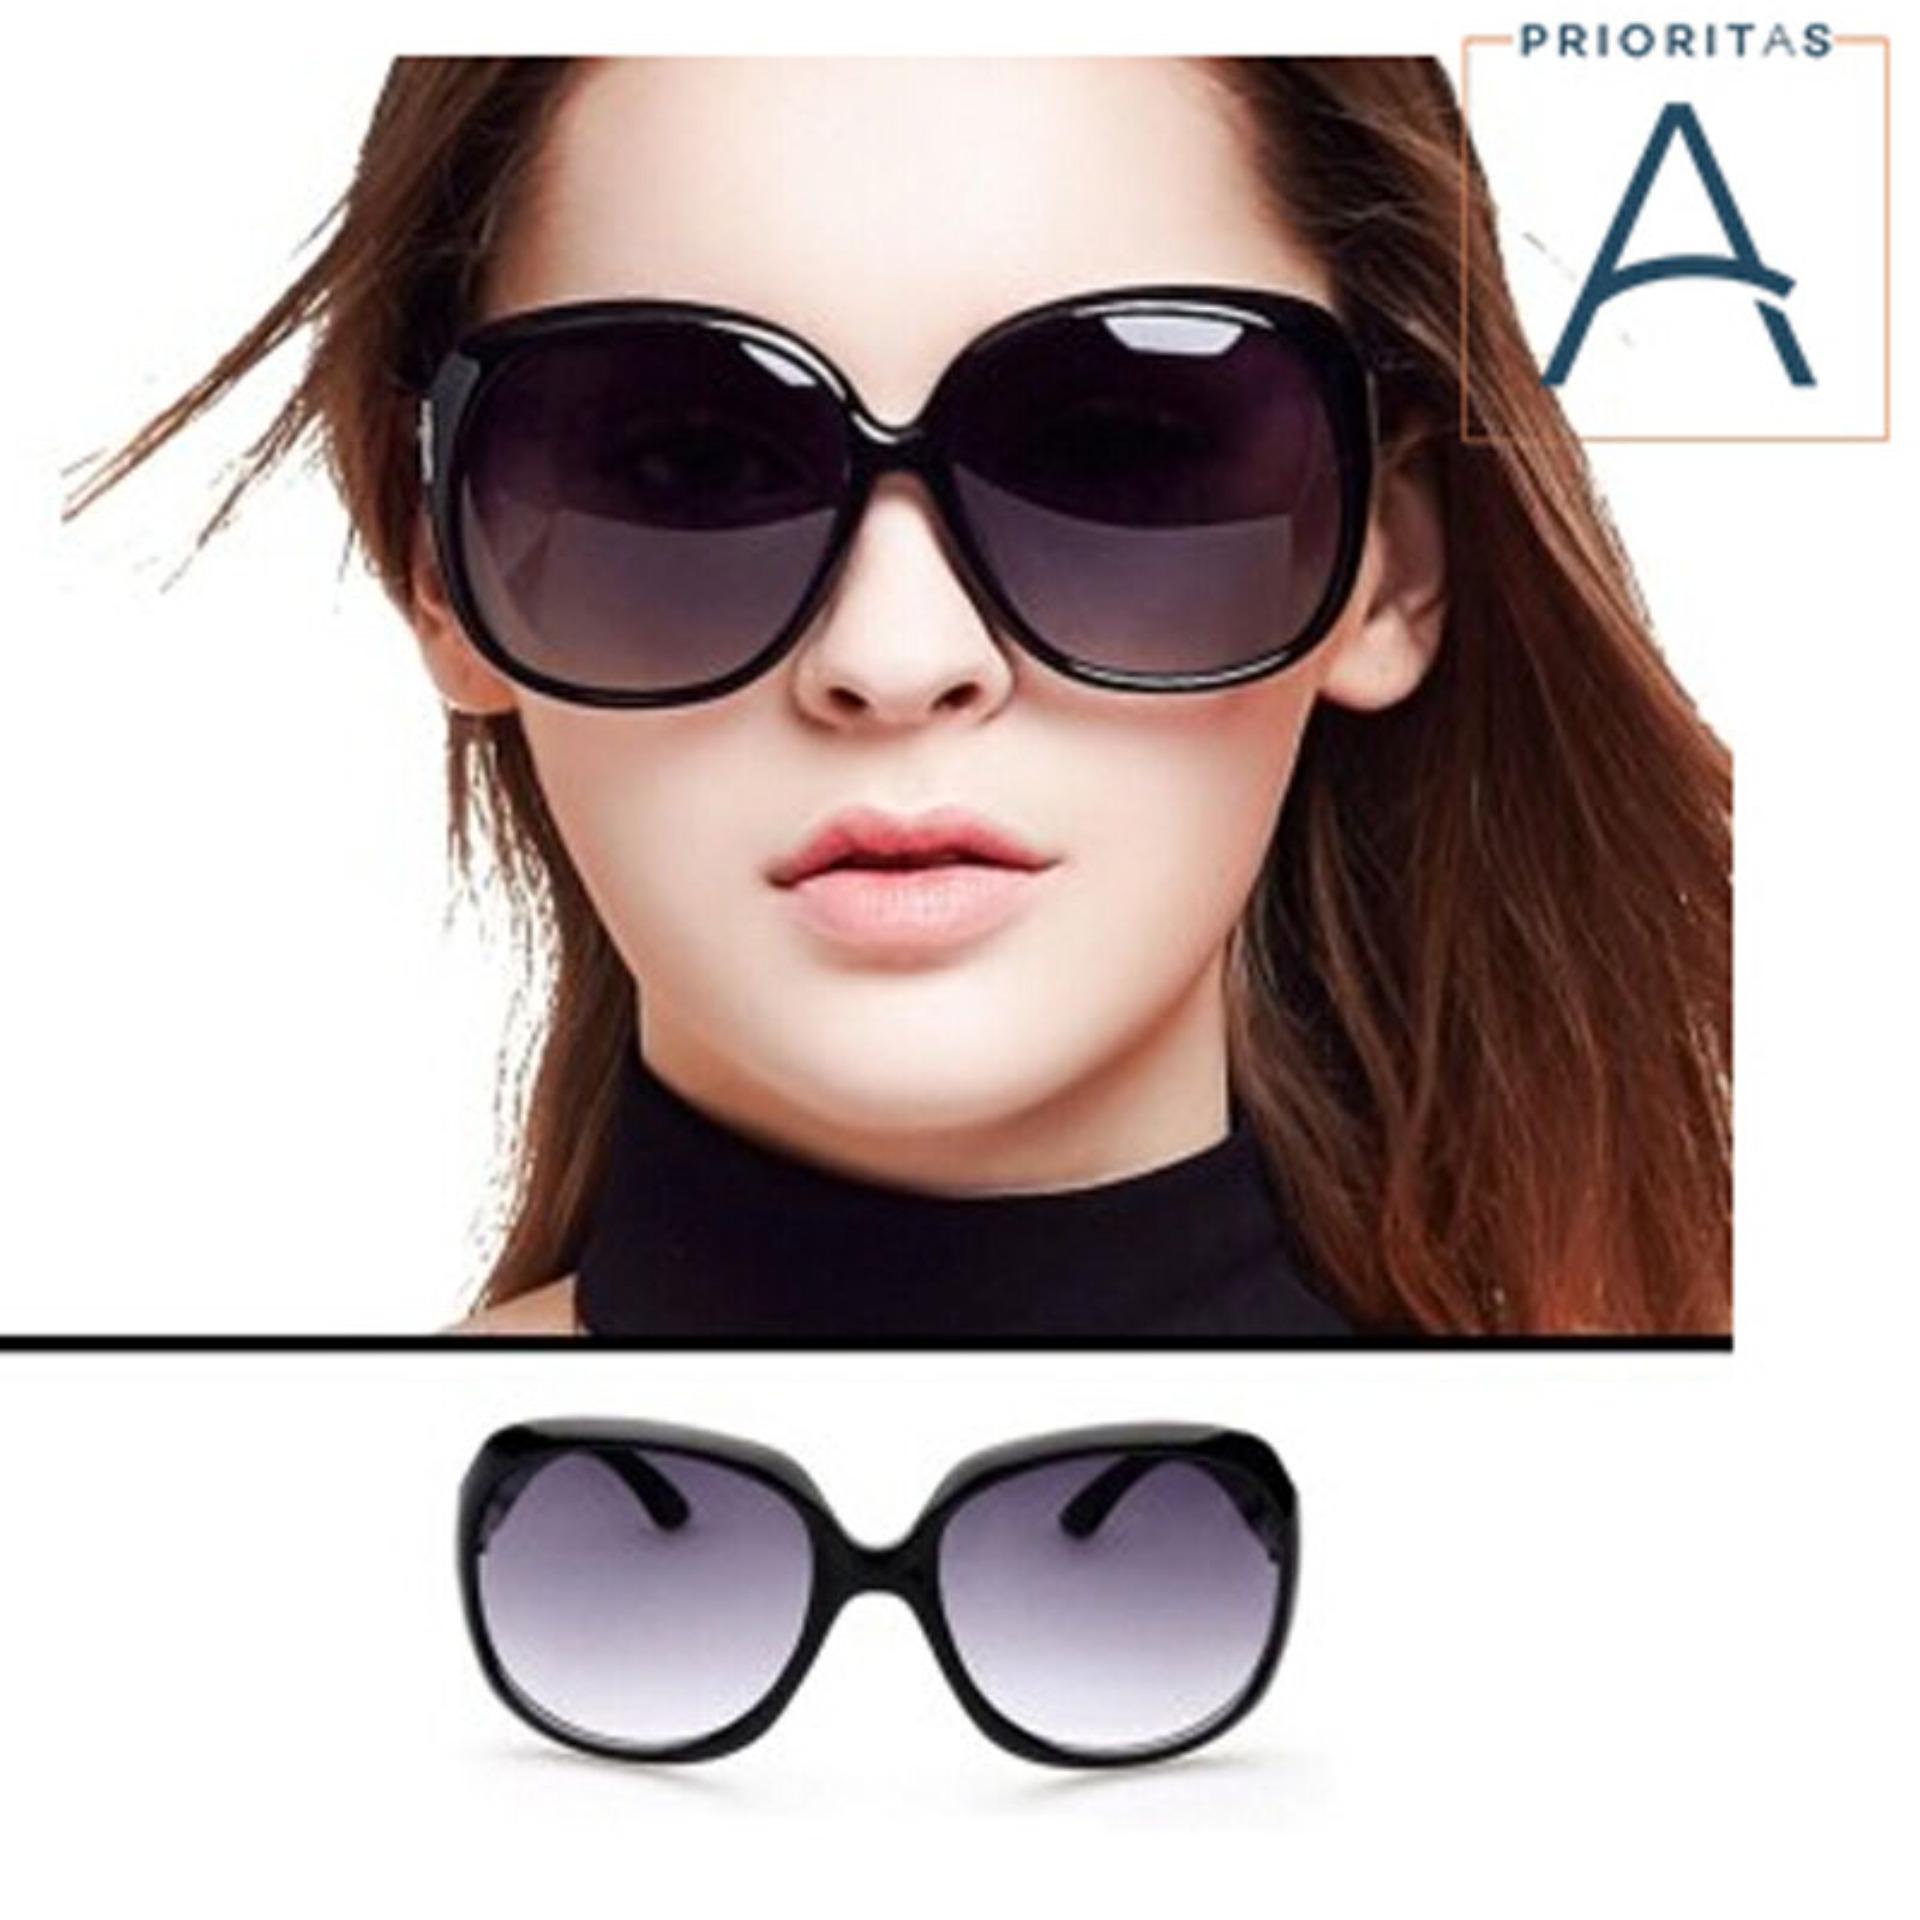 Diskon Wanita Terlalu Besar Round Sunglasses Mn2544 Blk Kacamata Wanita Akhir Tahun